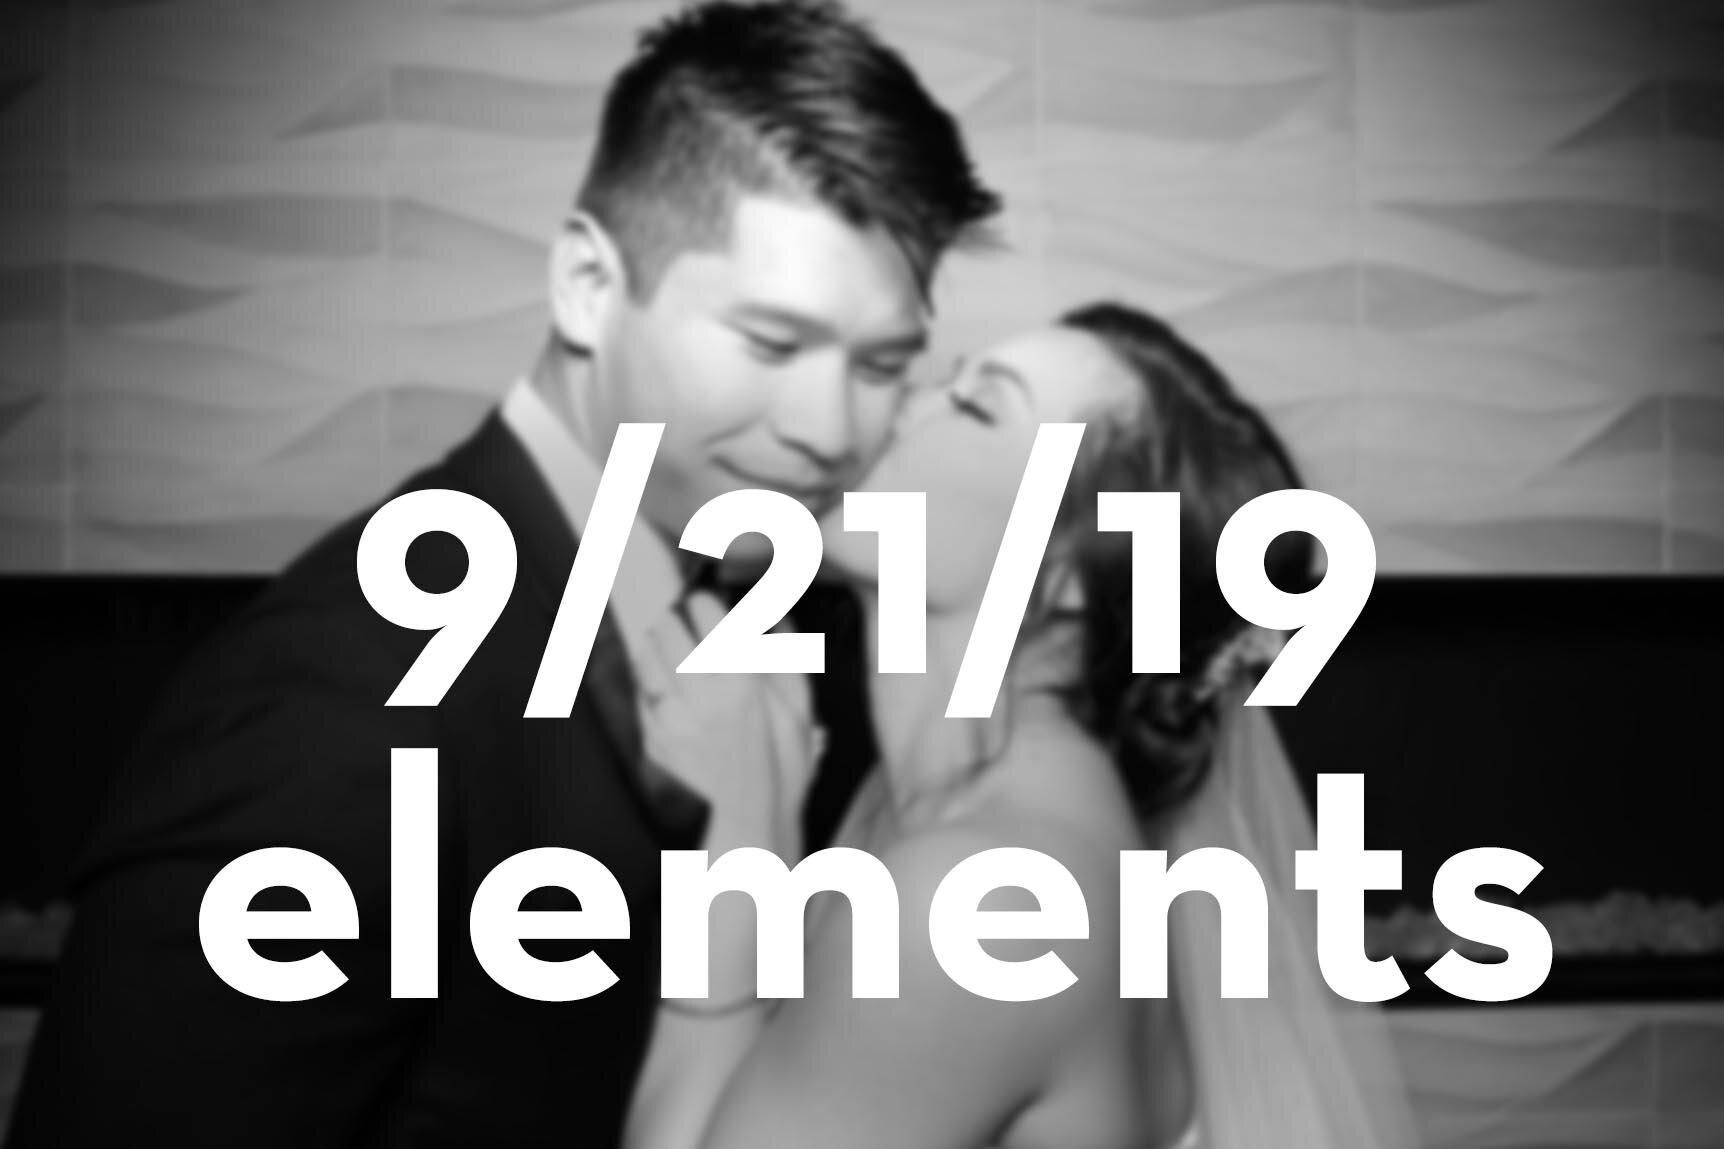 092119_elements.jpg